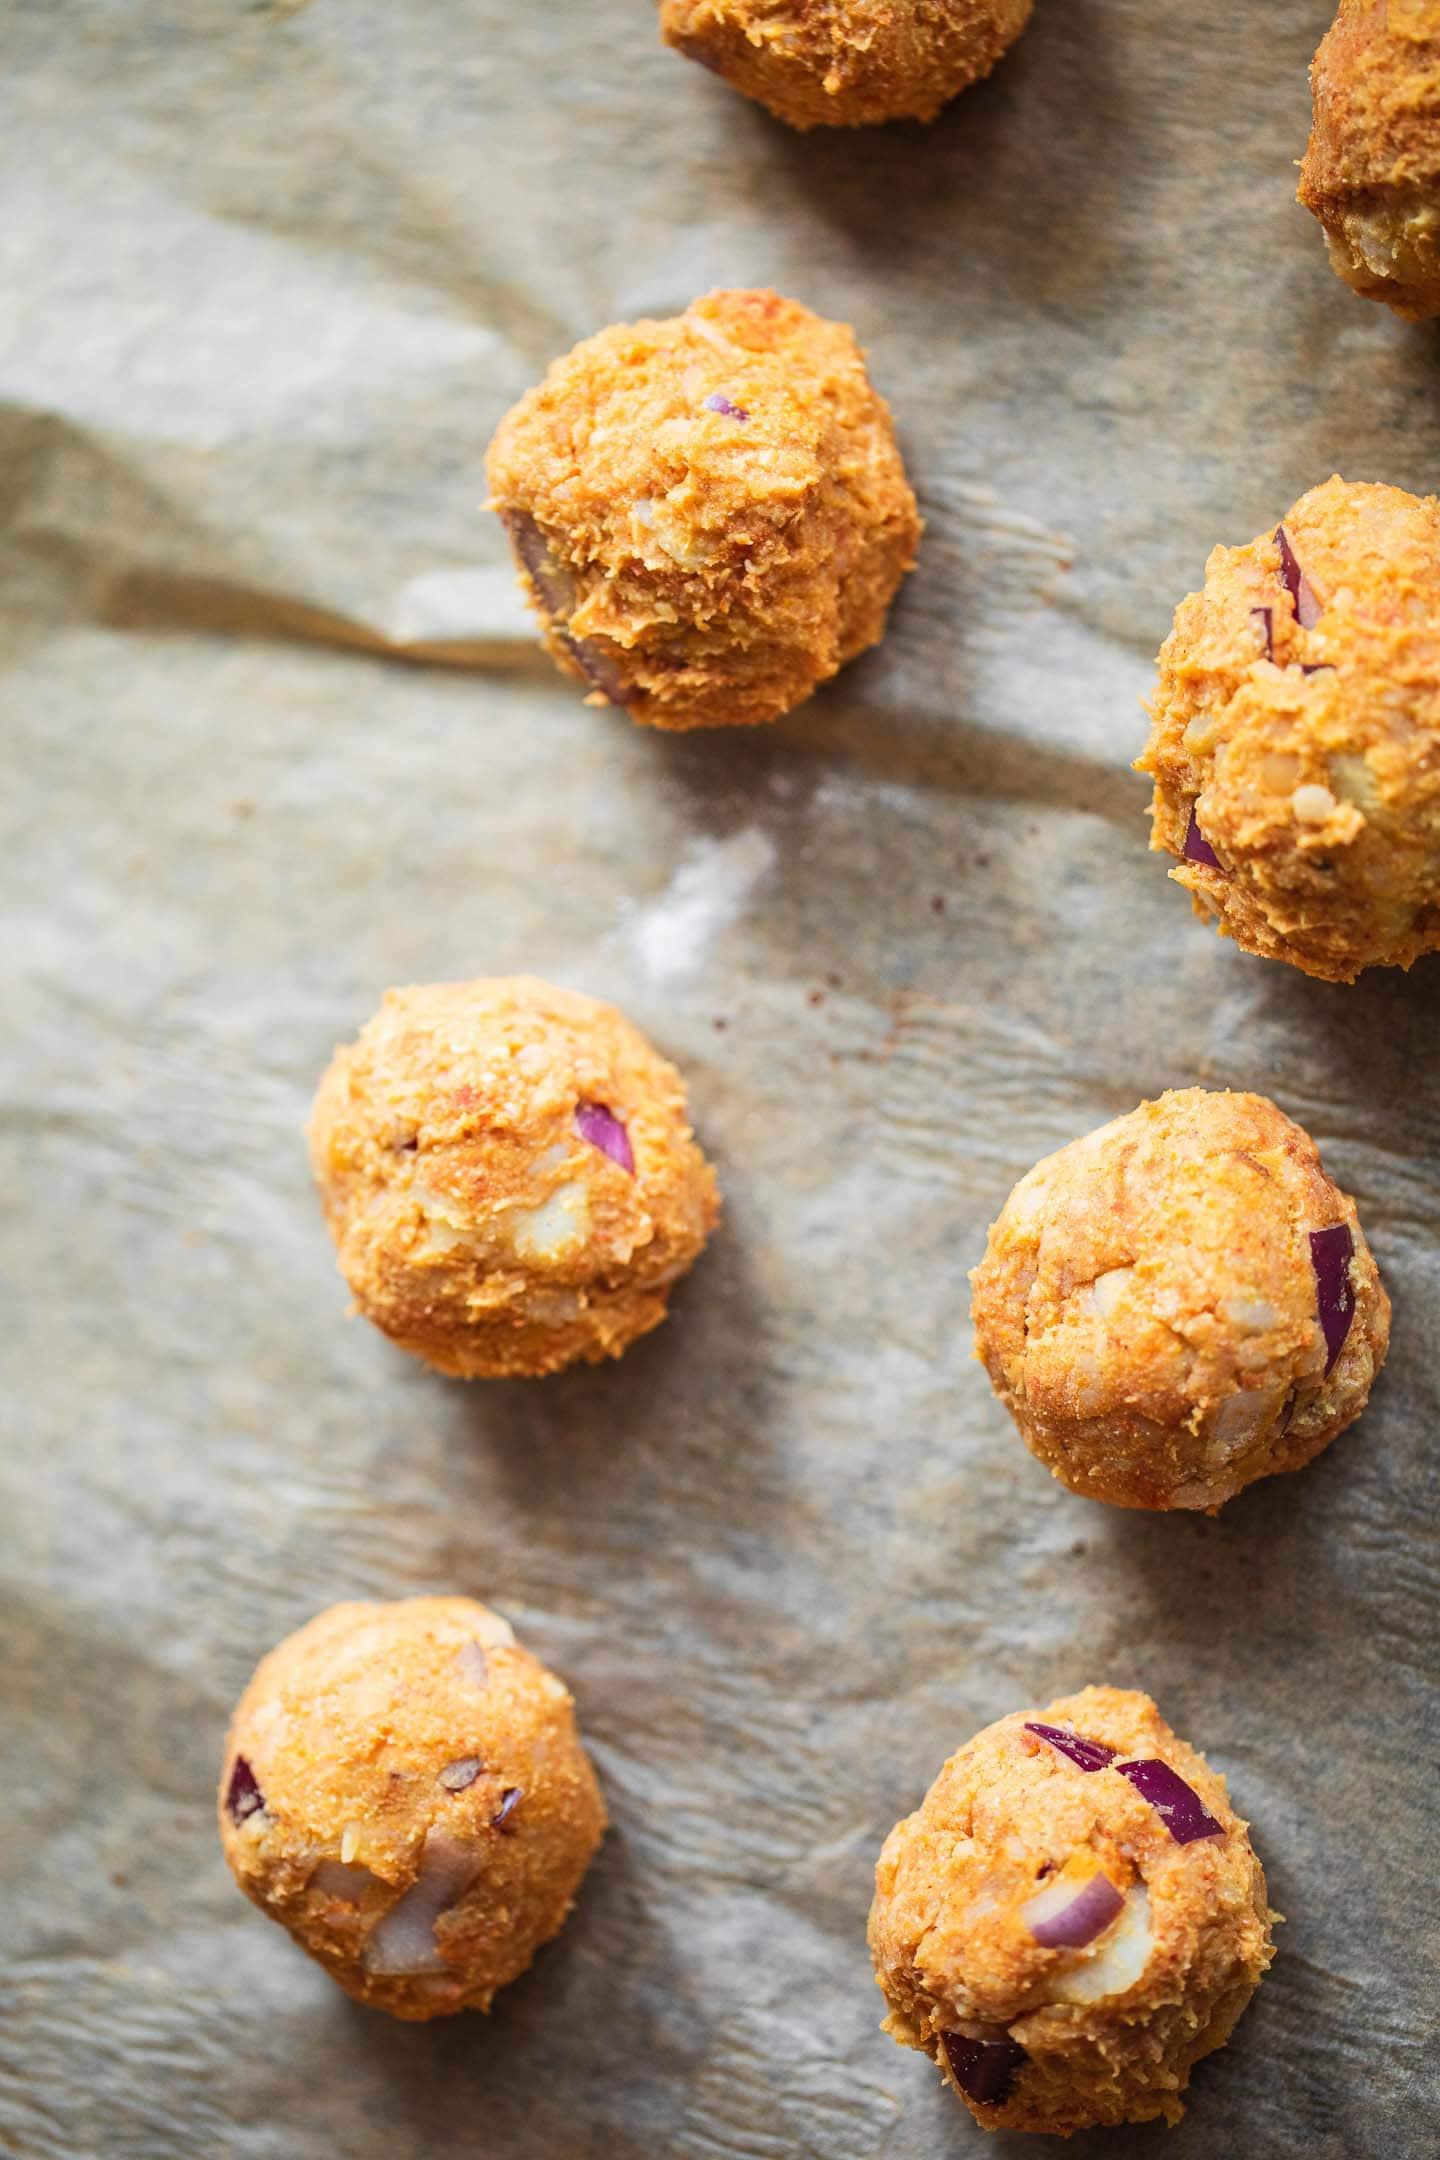 Vegan meatballs on a baking tray